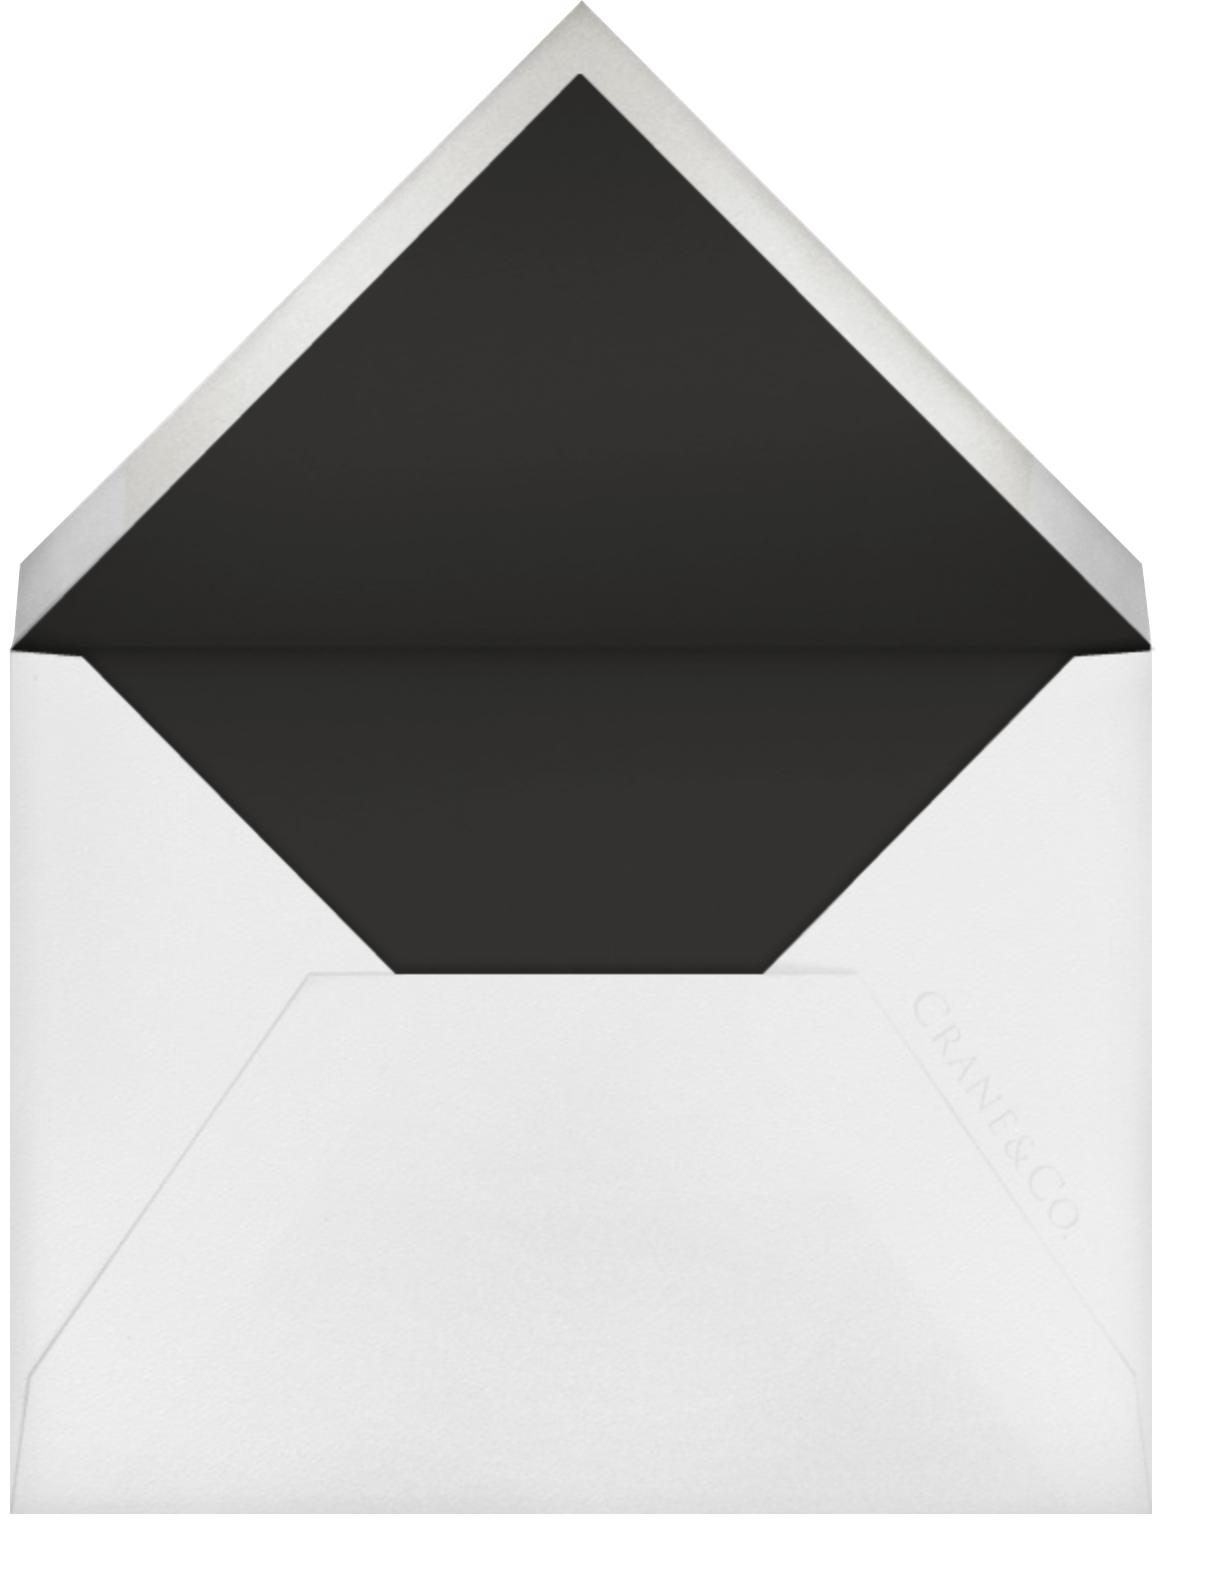 Polka Dot - Black - Oscar de la Renta - Reception - envelope back